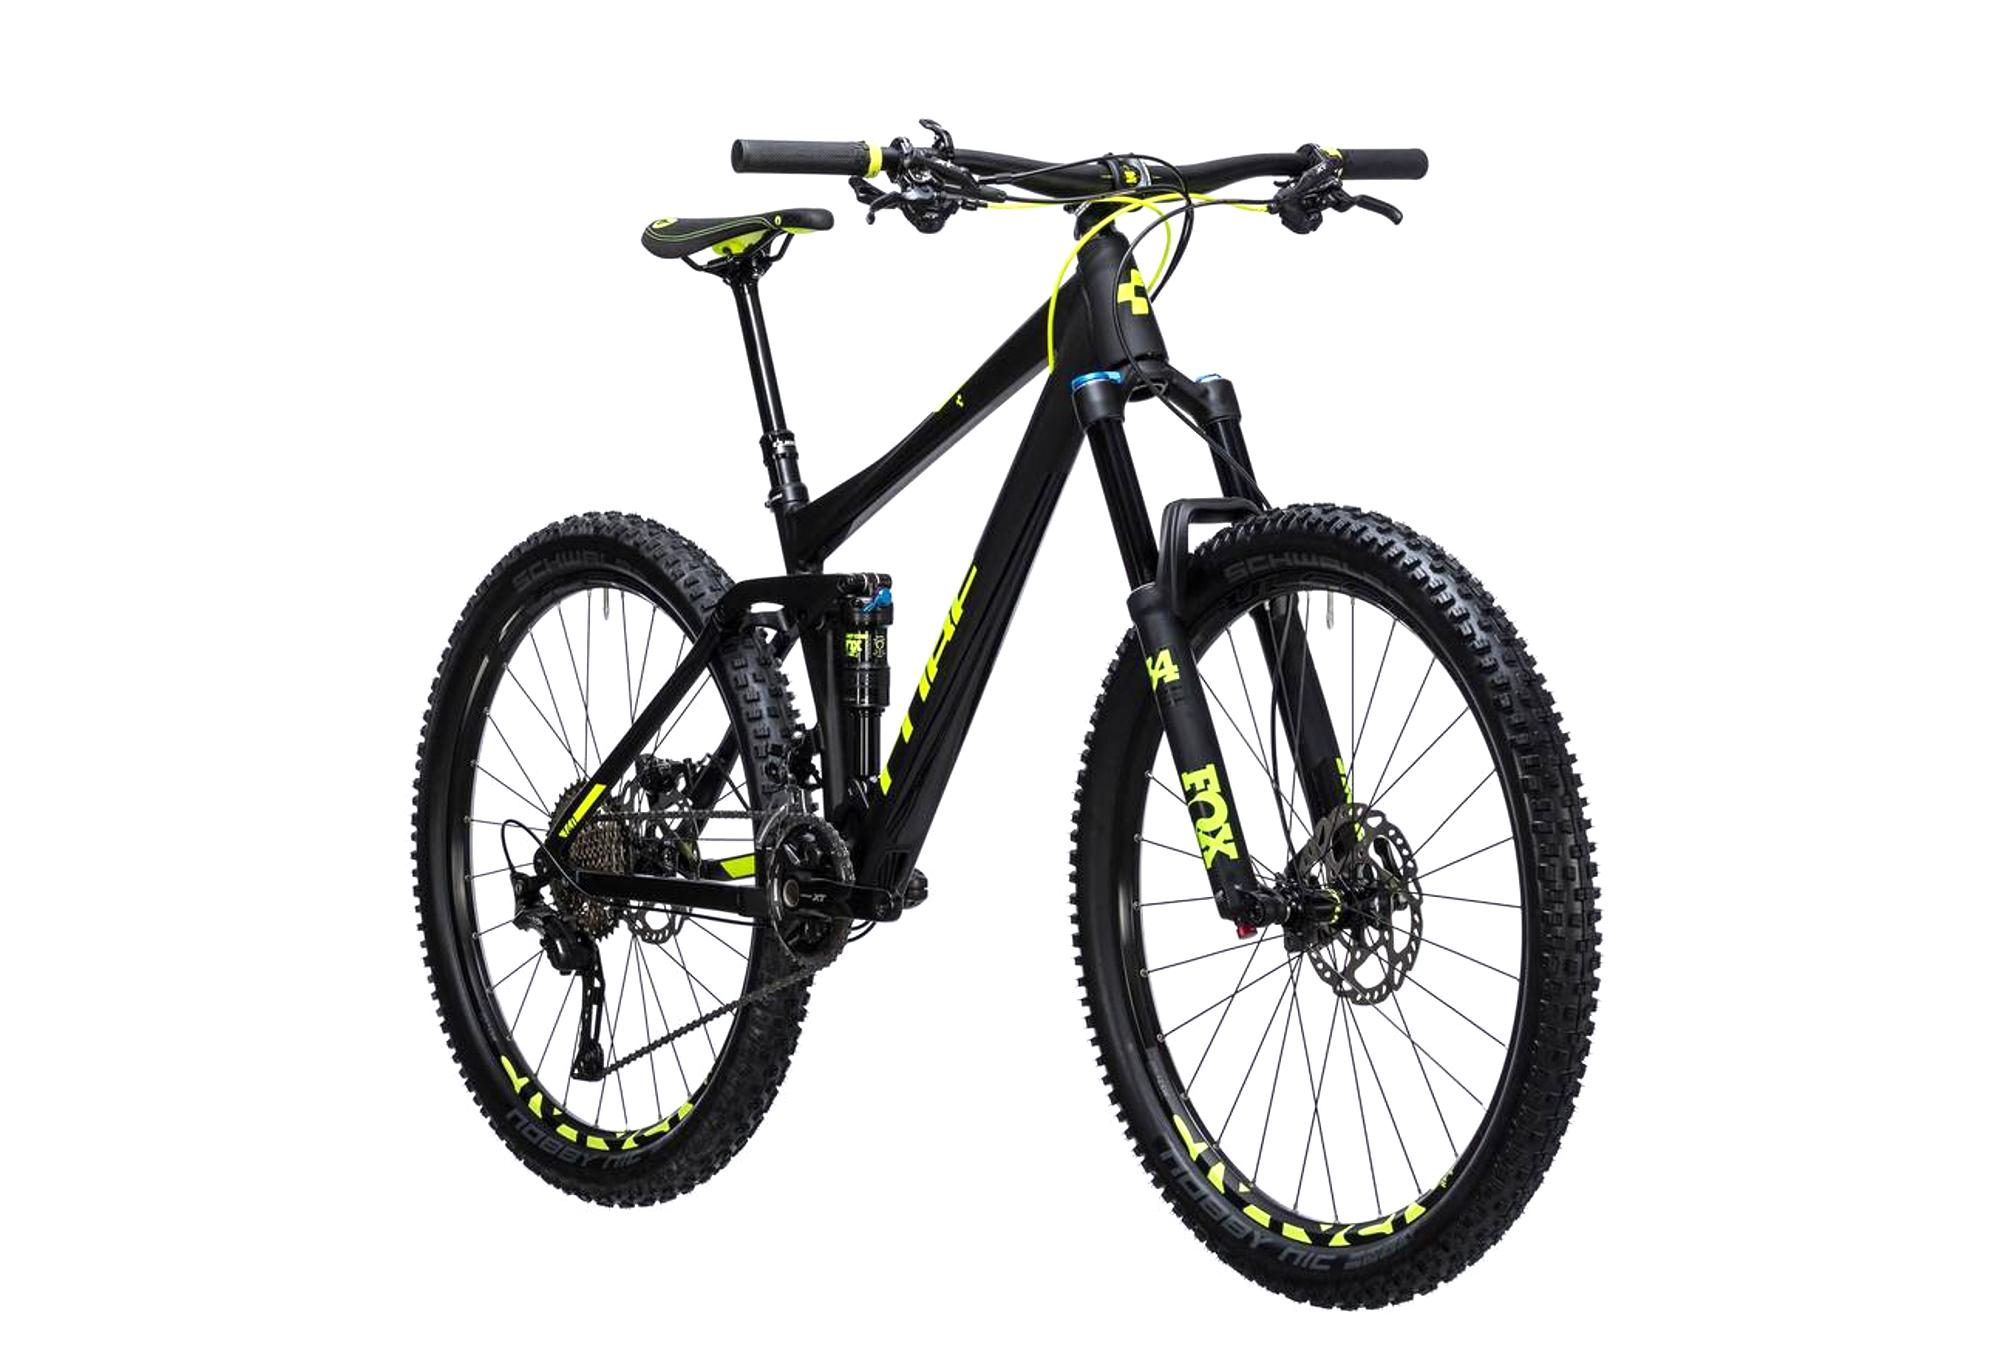 Cube Stereo 140 Hpa Race Bike 27 5 Shimano Xt 11s Black Yellow